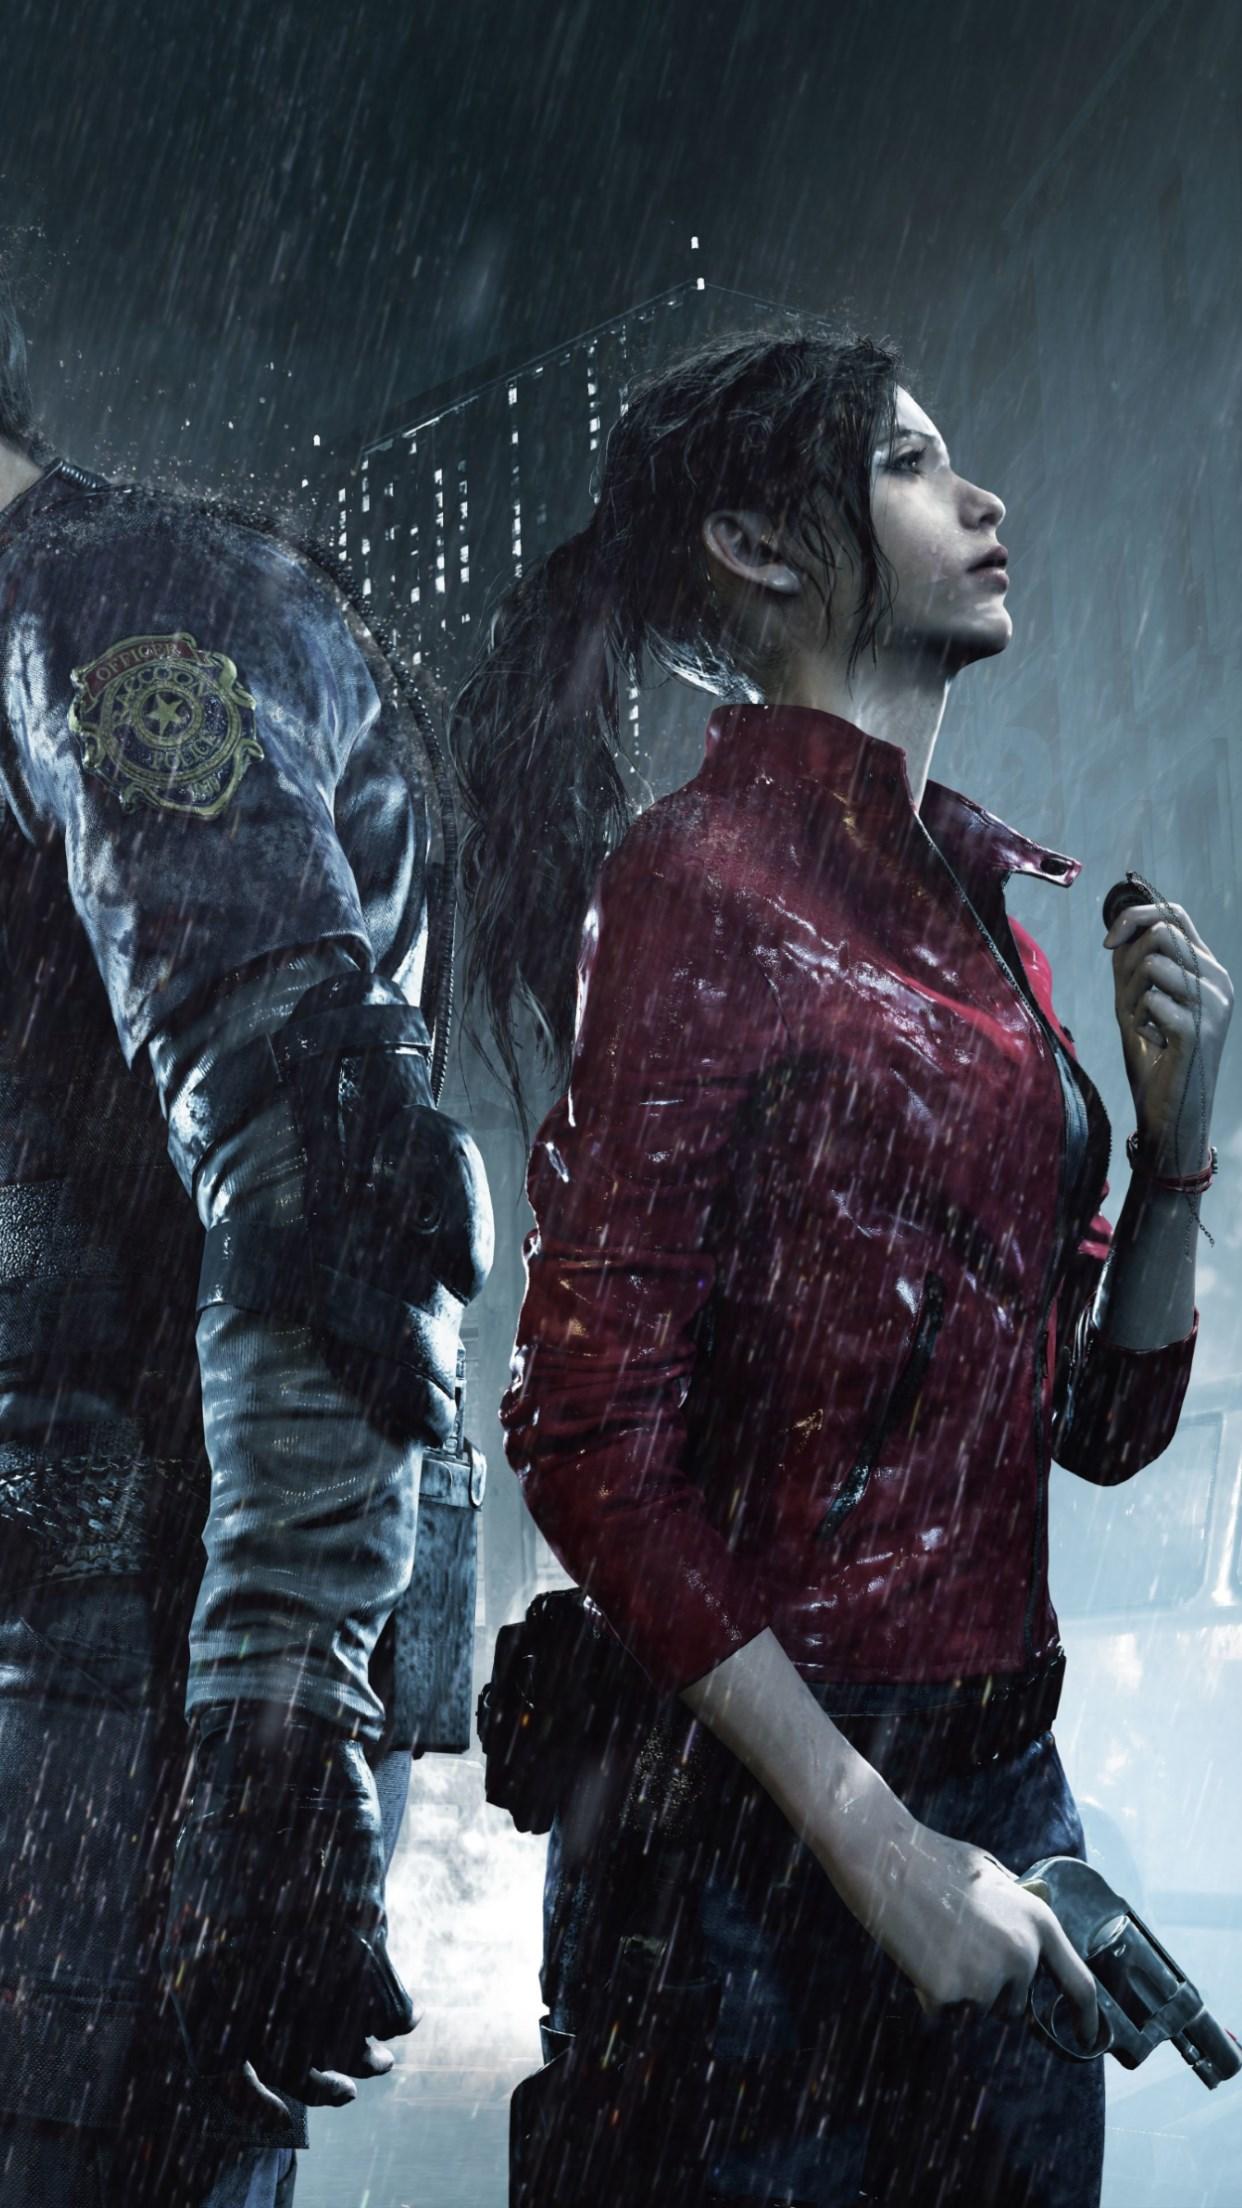 Download Wallpaper Resident Evil 2 1242x2208